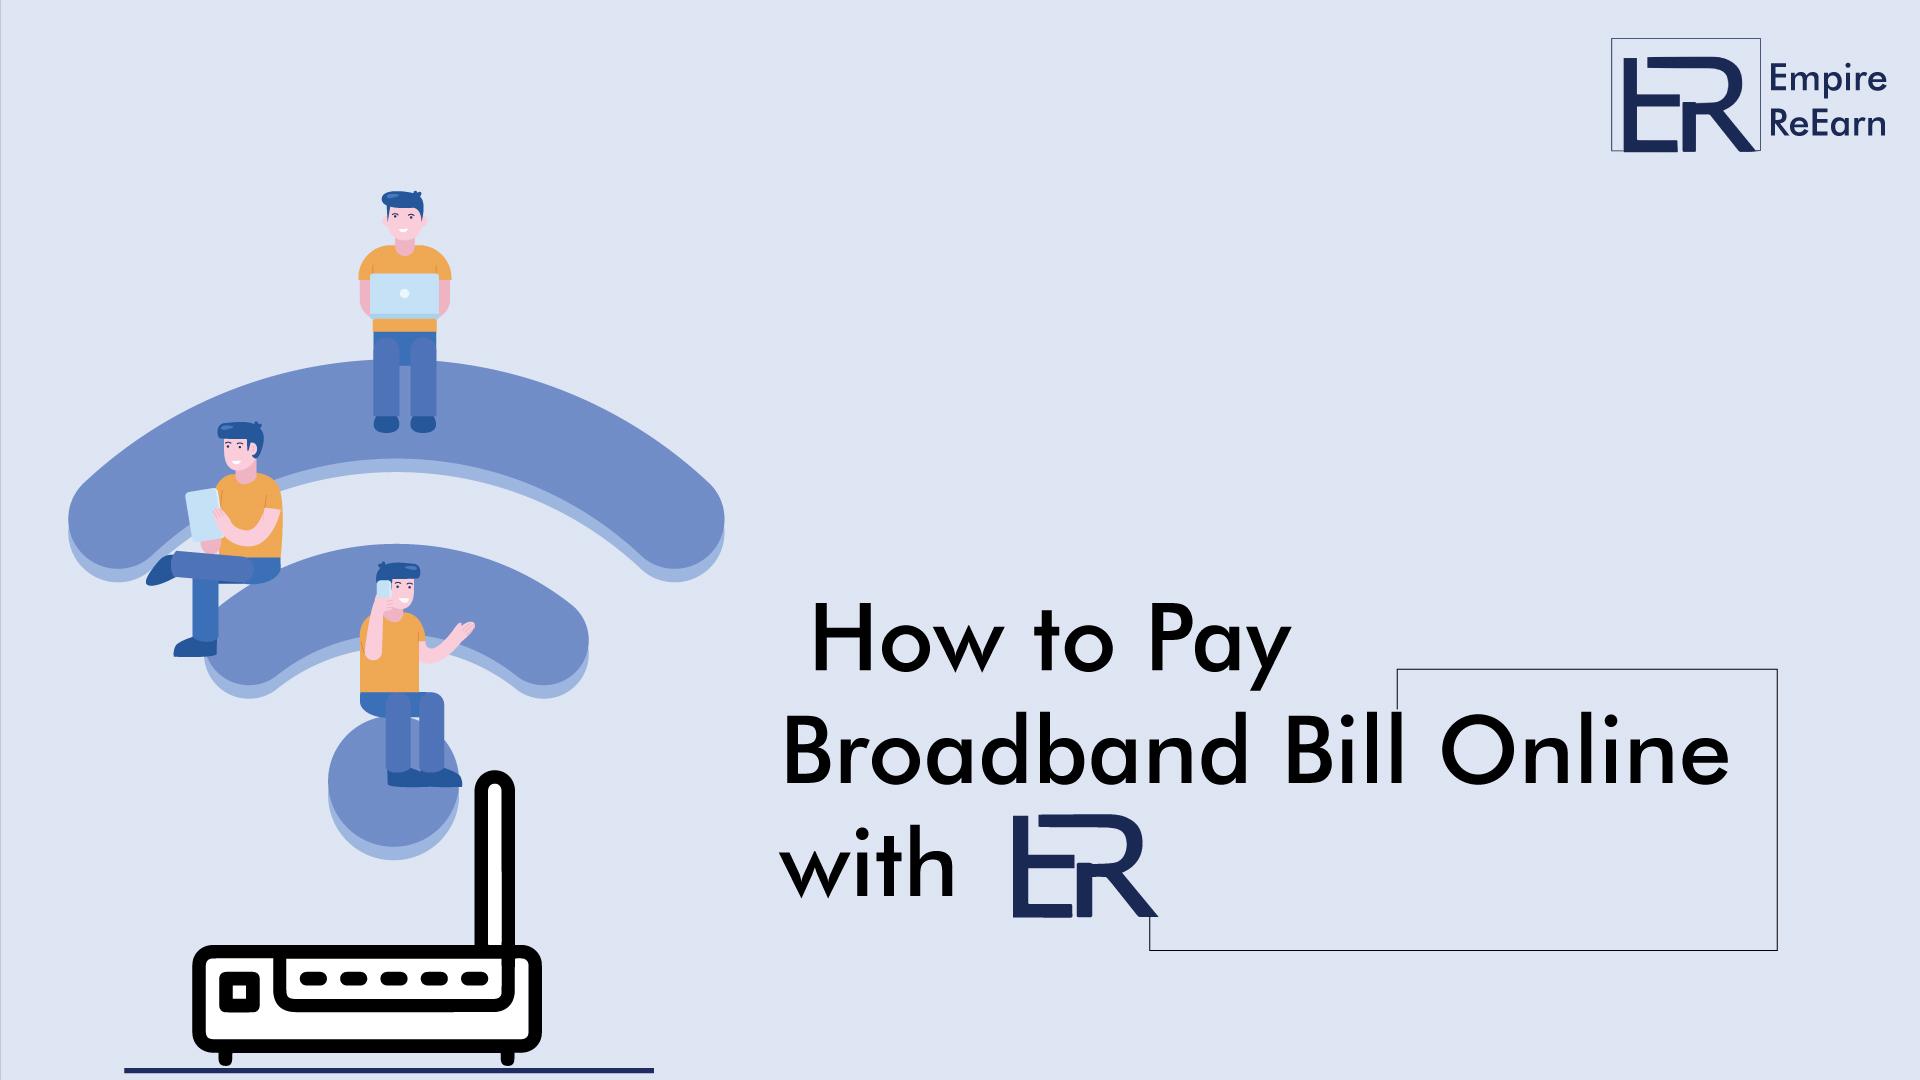 Pay Broadband Bill Online with Empire ReEarn